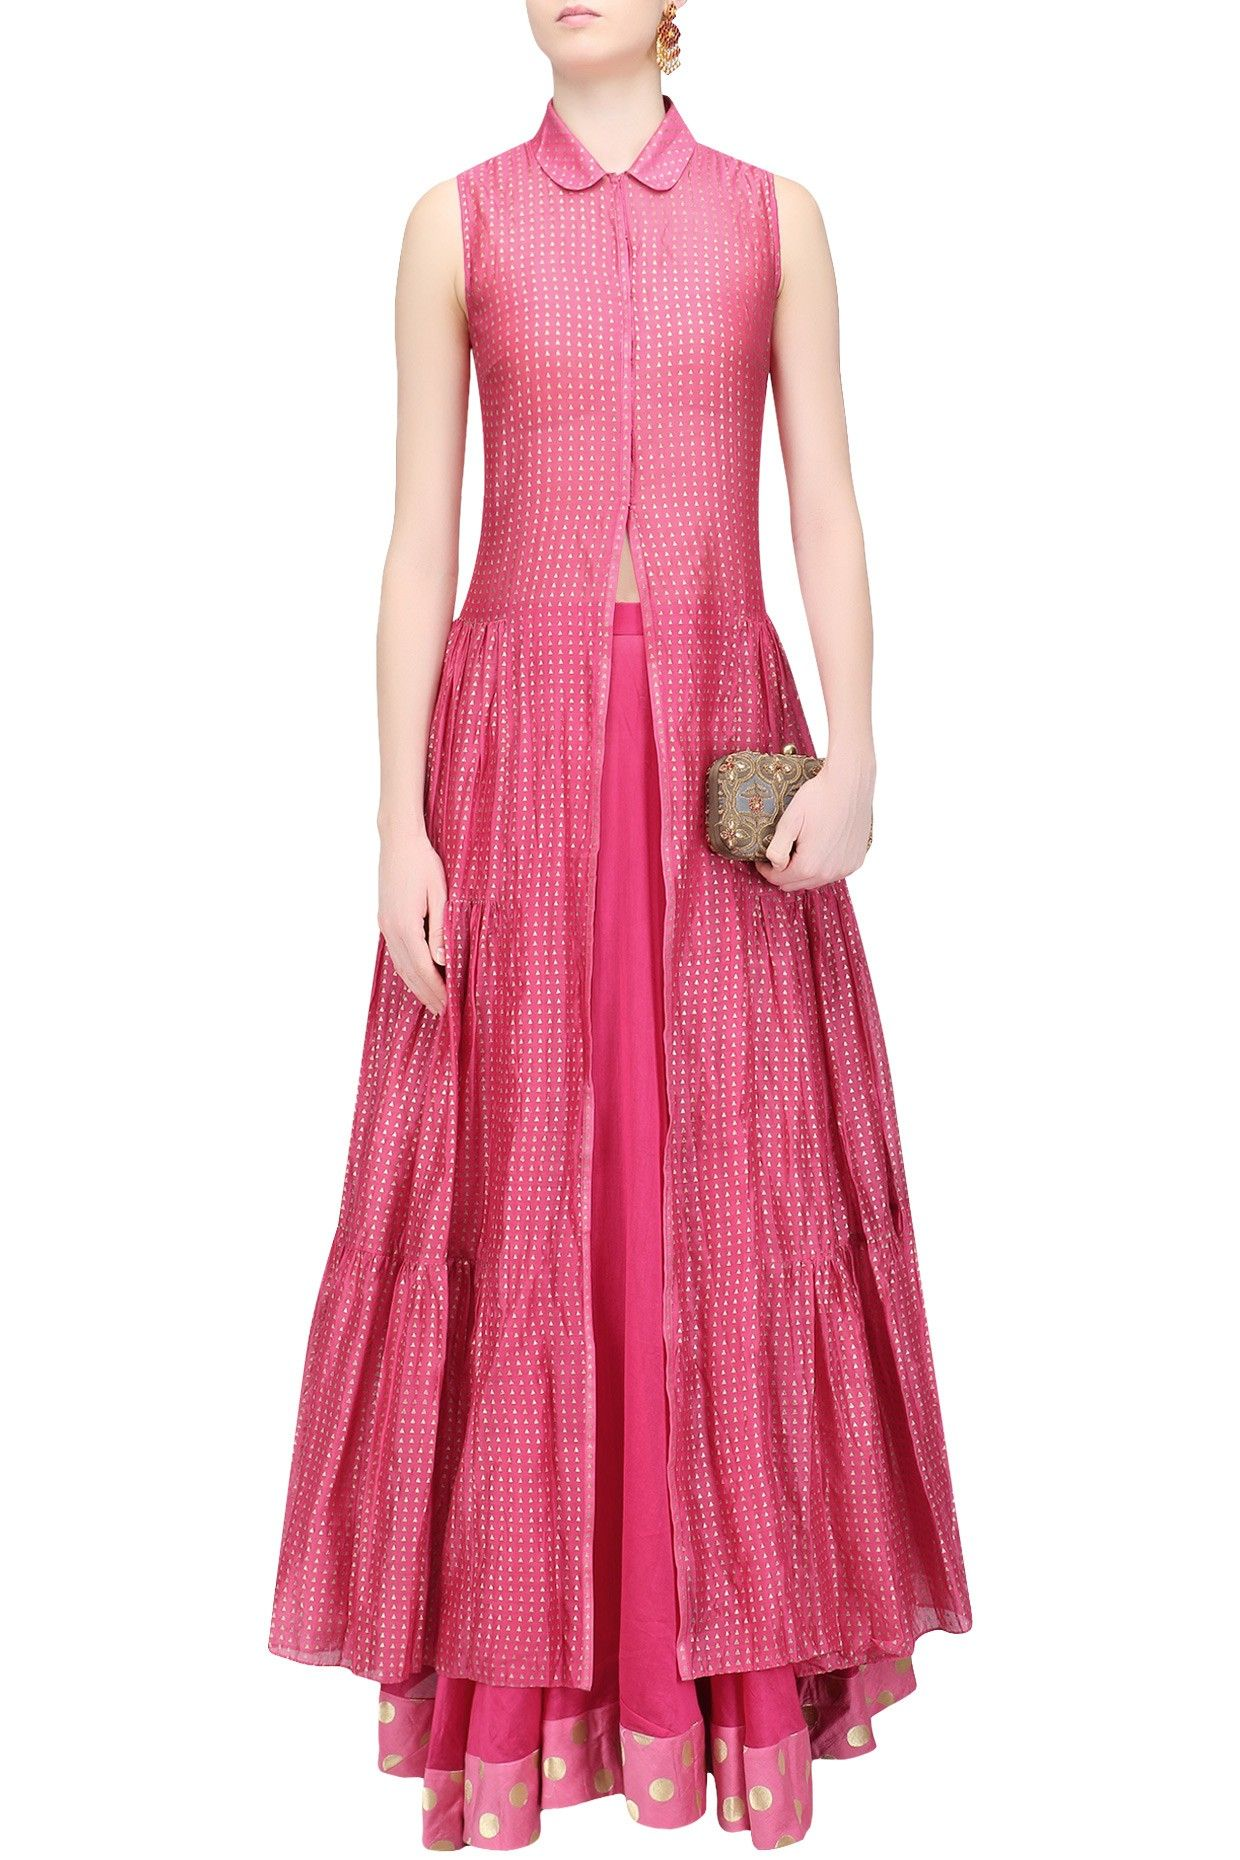 6daf43d3183 Myoho New Kurti, Celebrity Closets, Indian Dresses, Indian Outfits,  Designer Kurtis,